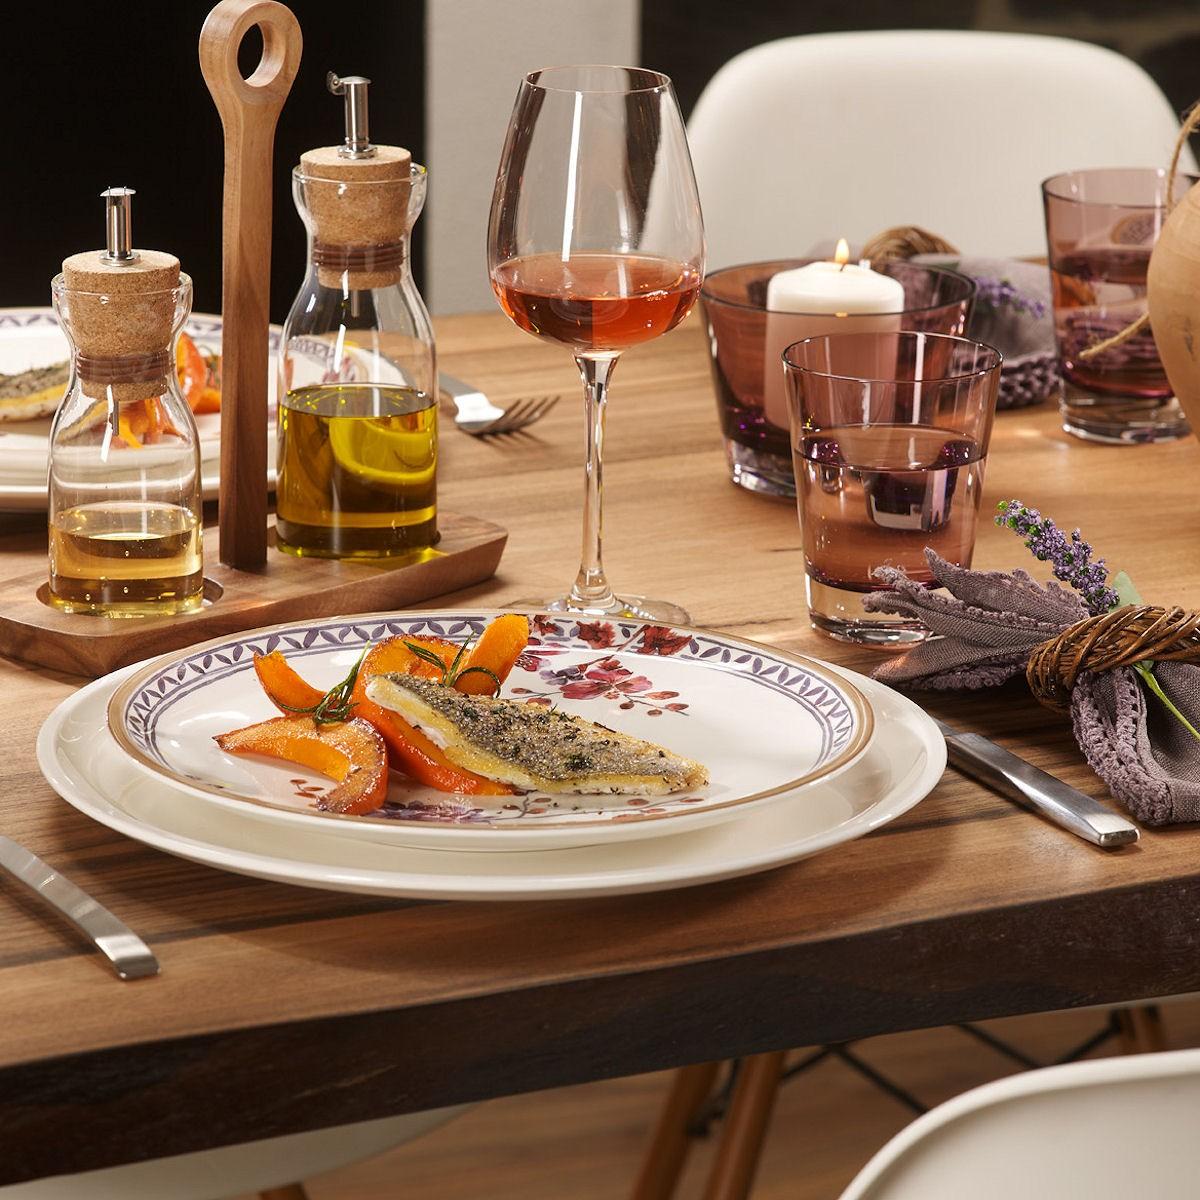 Villeroy & Boch Artesano Provencal Lavendel talerz głęboki